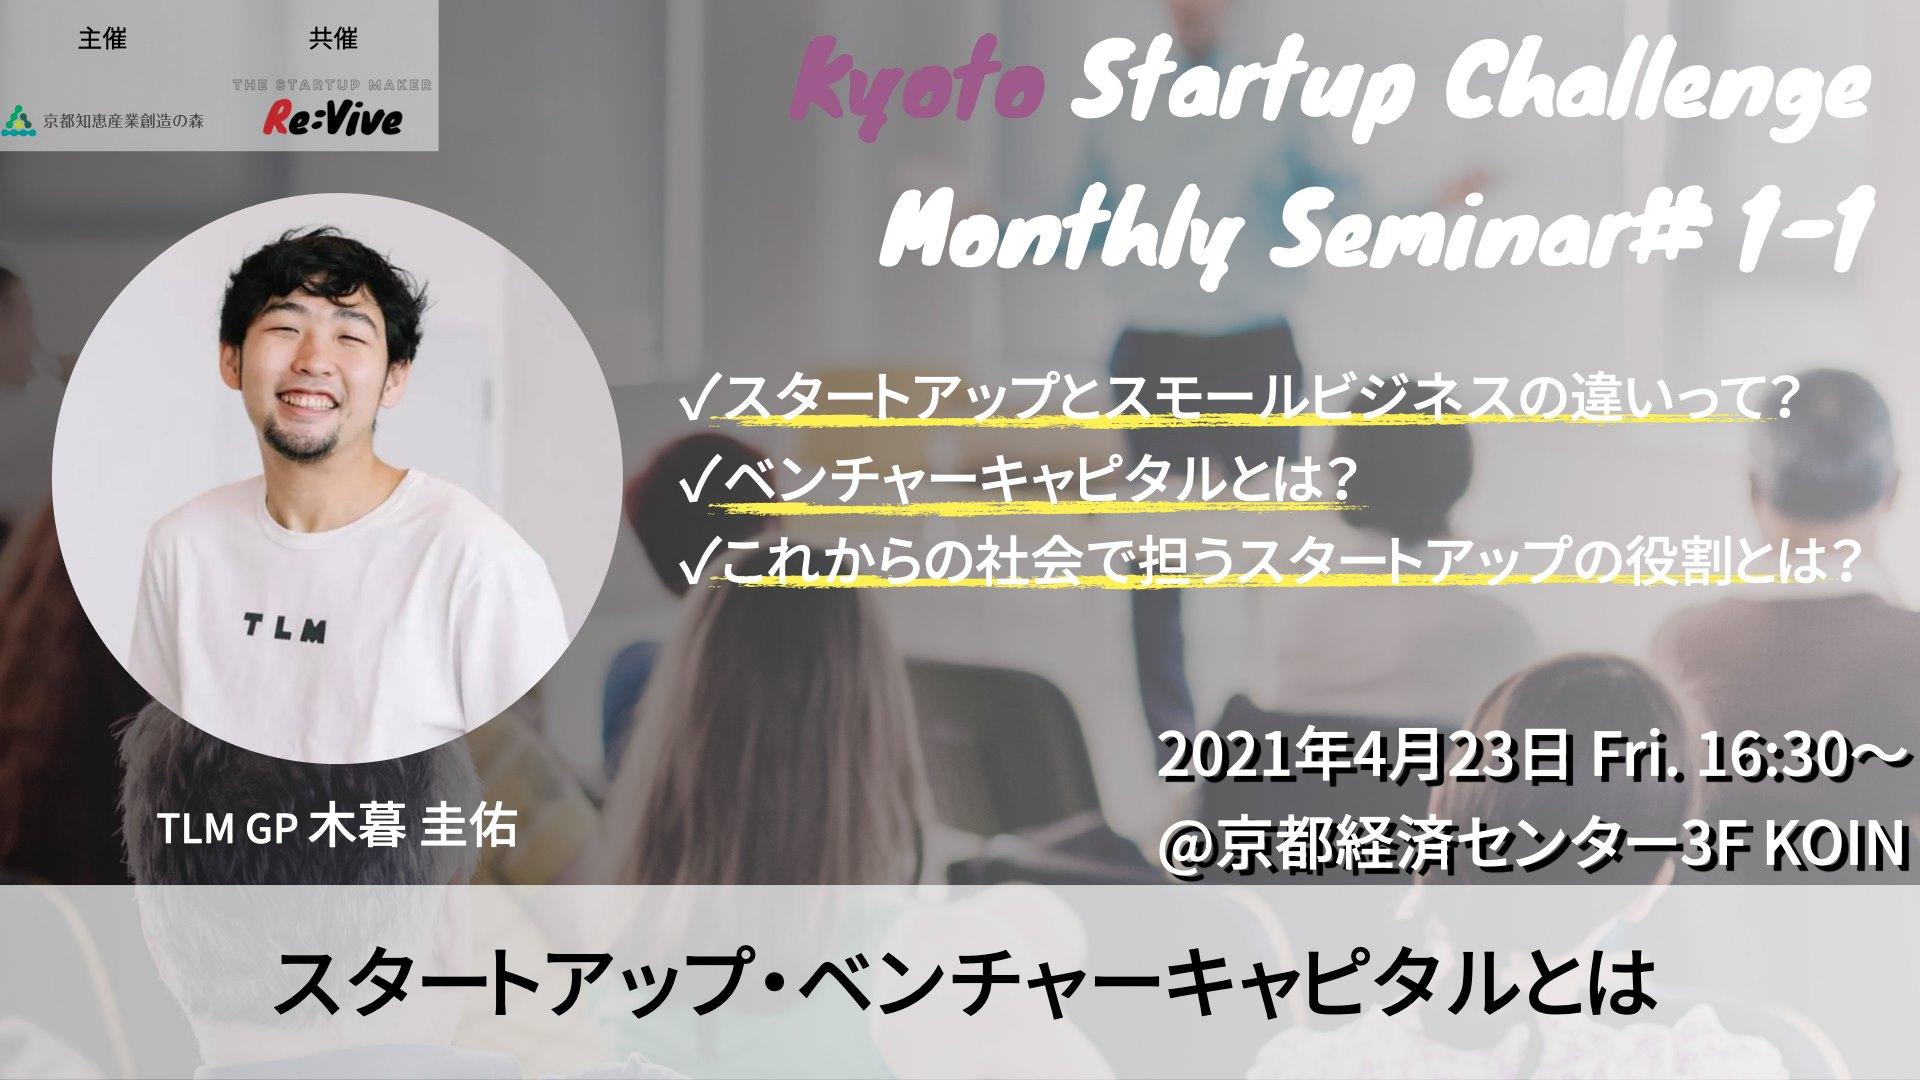 Kyoto Startup Challenge / Seminar ①-「スタートアップ、ベンチャーキャピタルとは」-(2021/4/28開催)